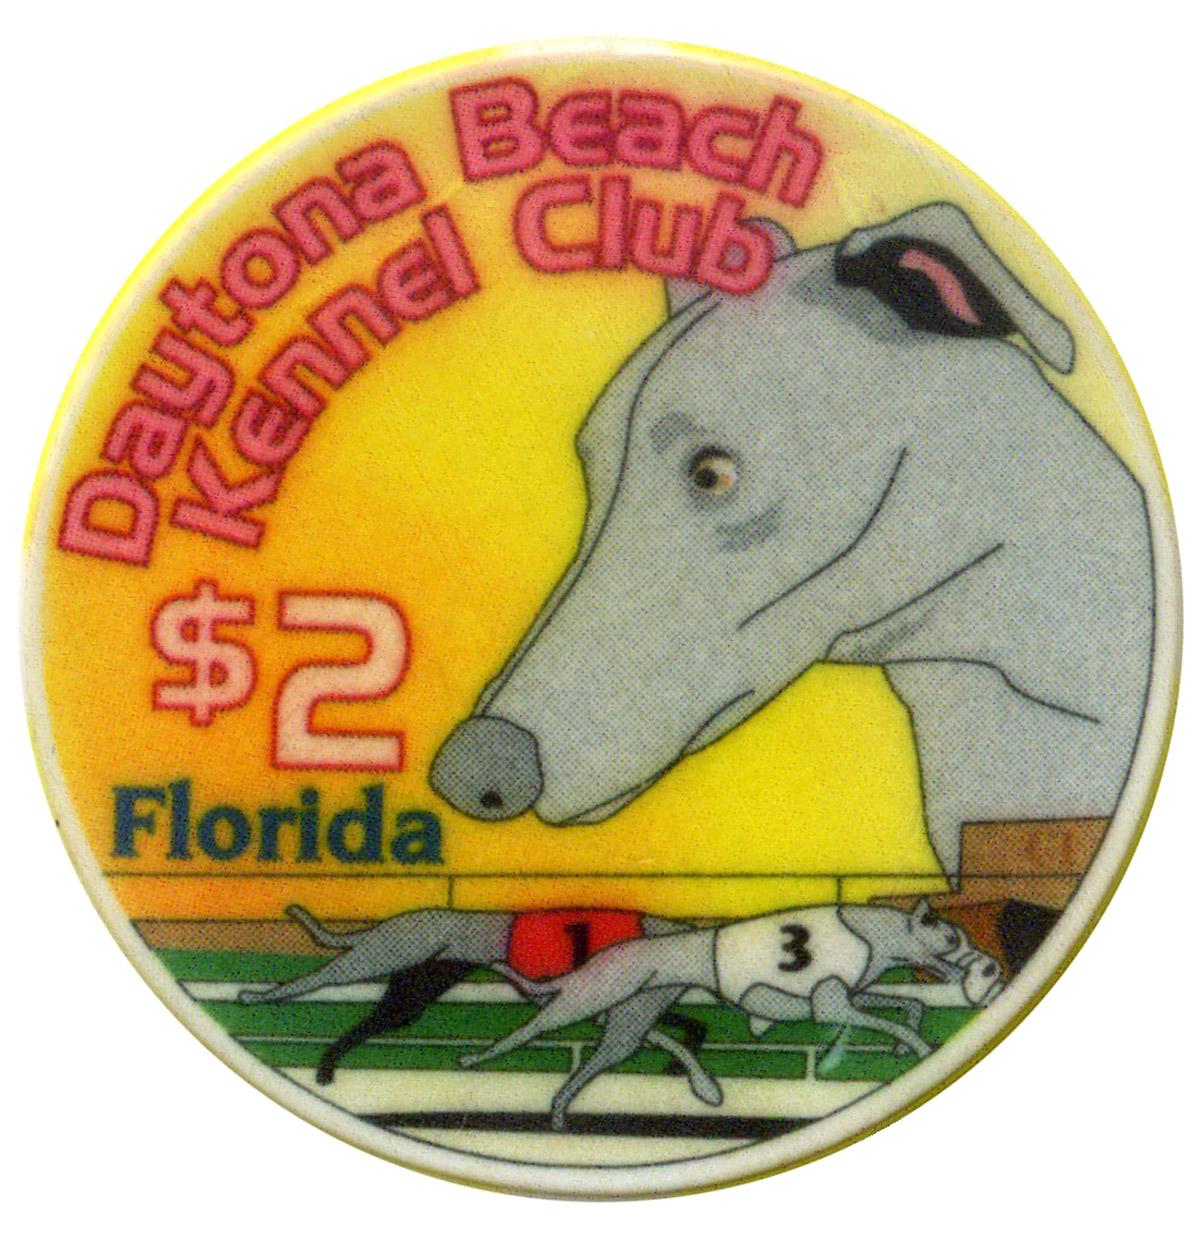 Daytona Beach Poker